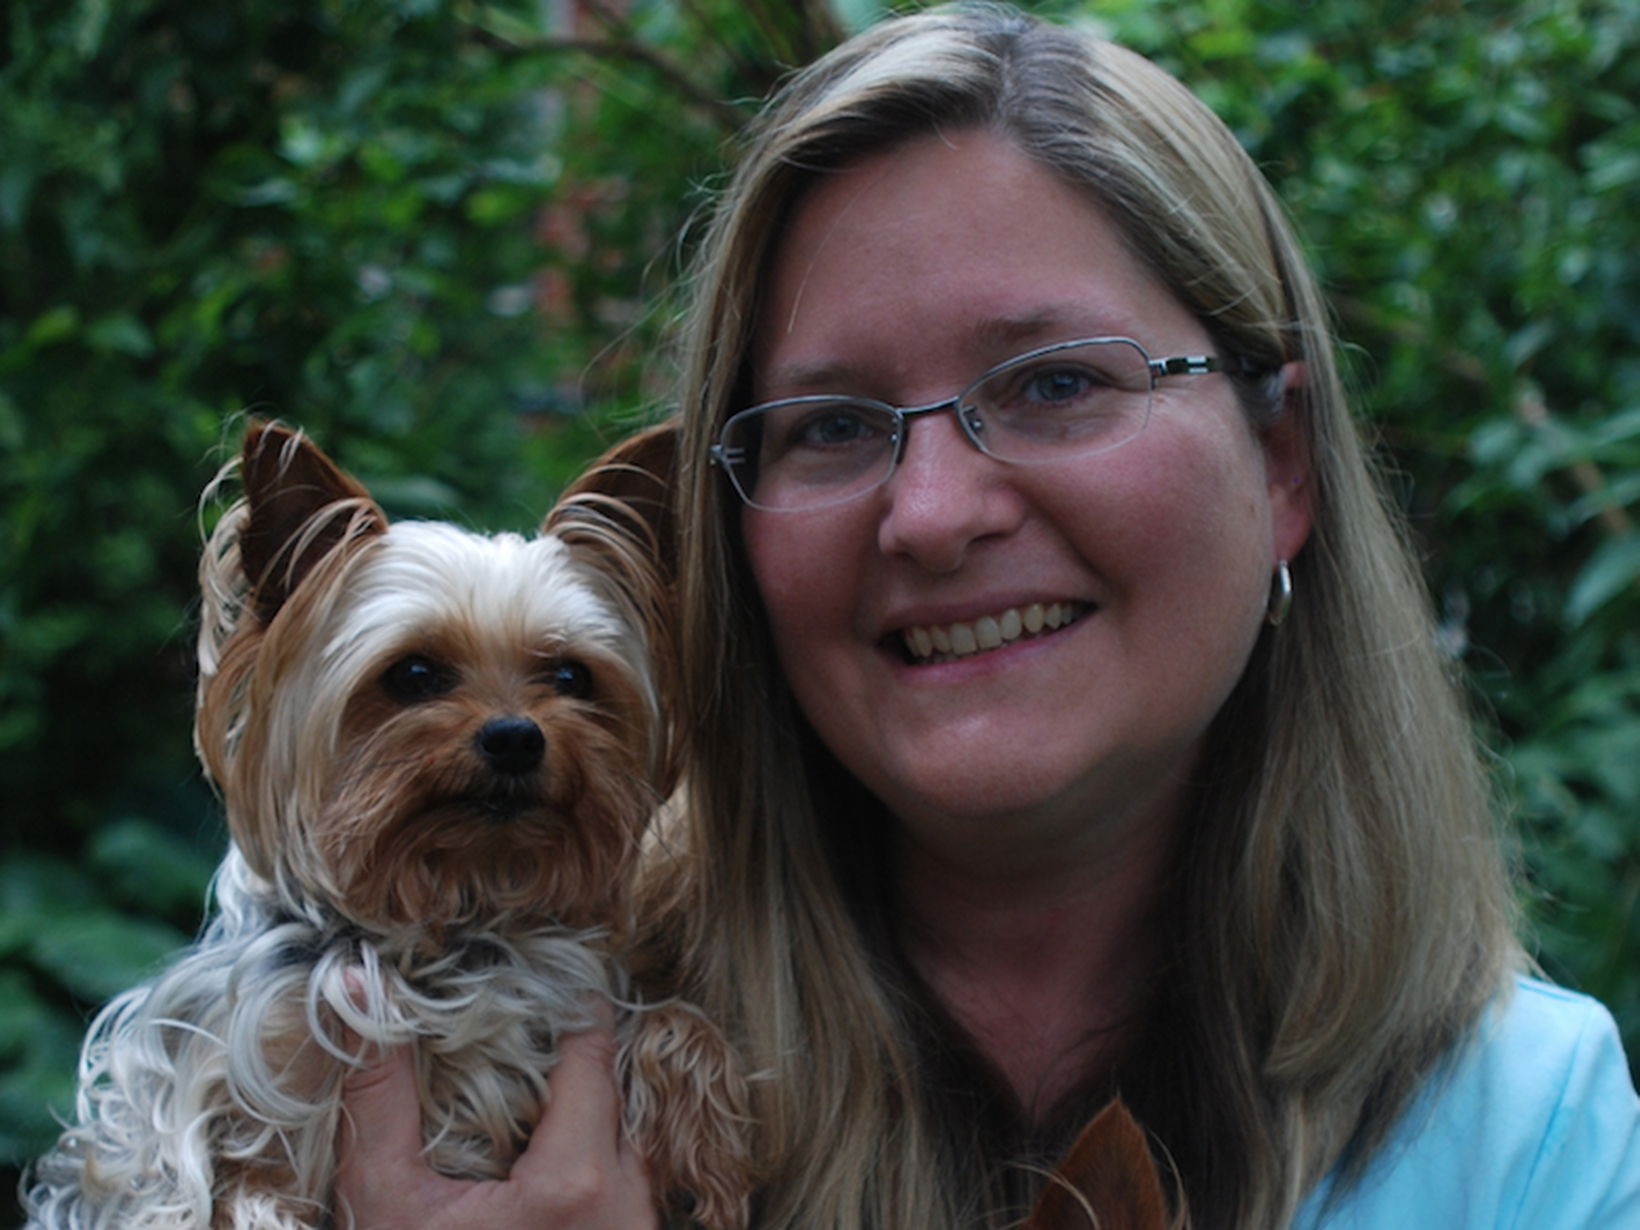 Paulette from Oconomowoc, Wisconsin, United States